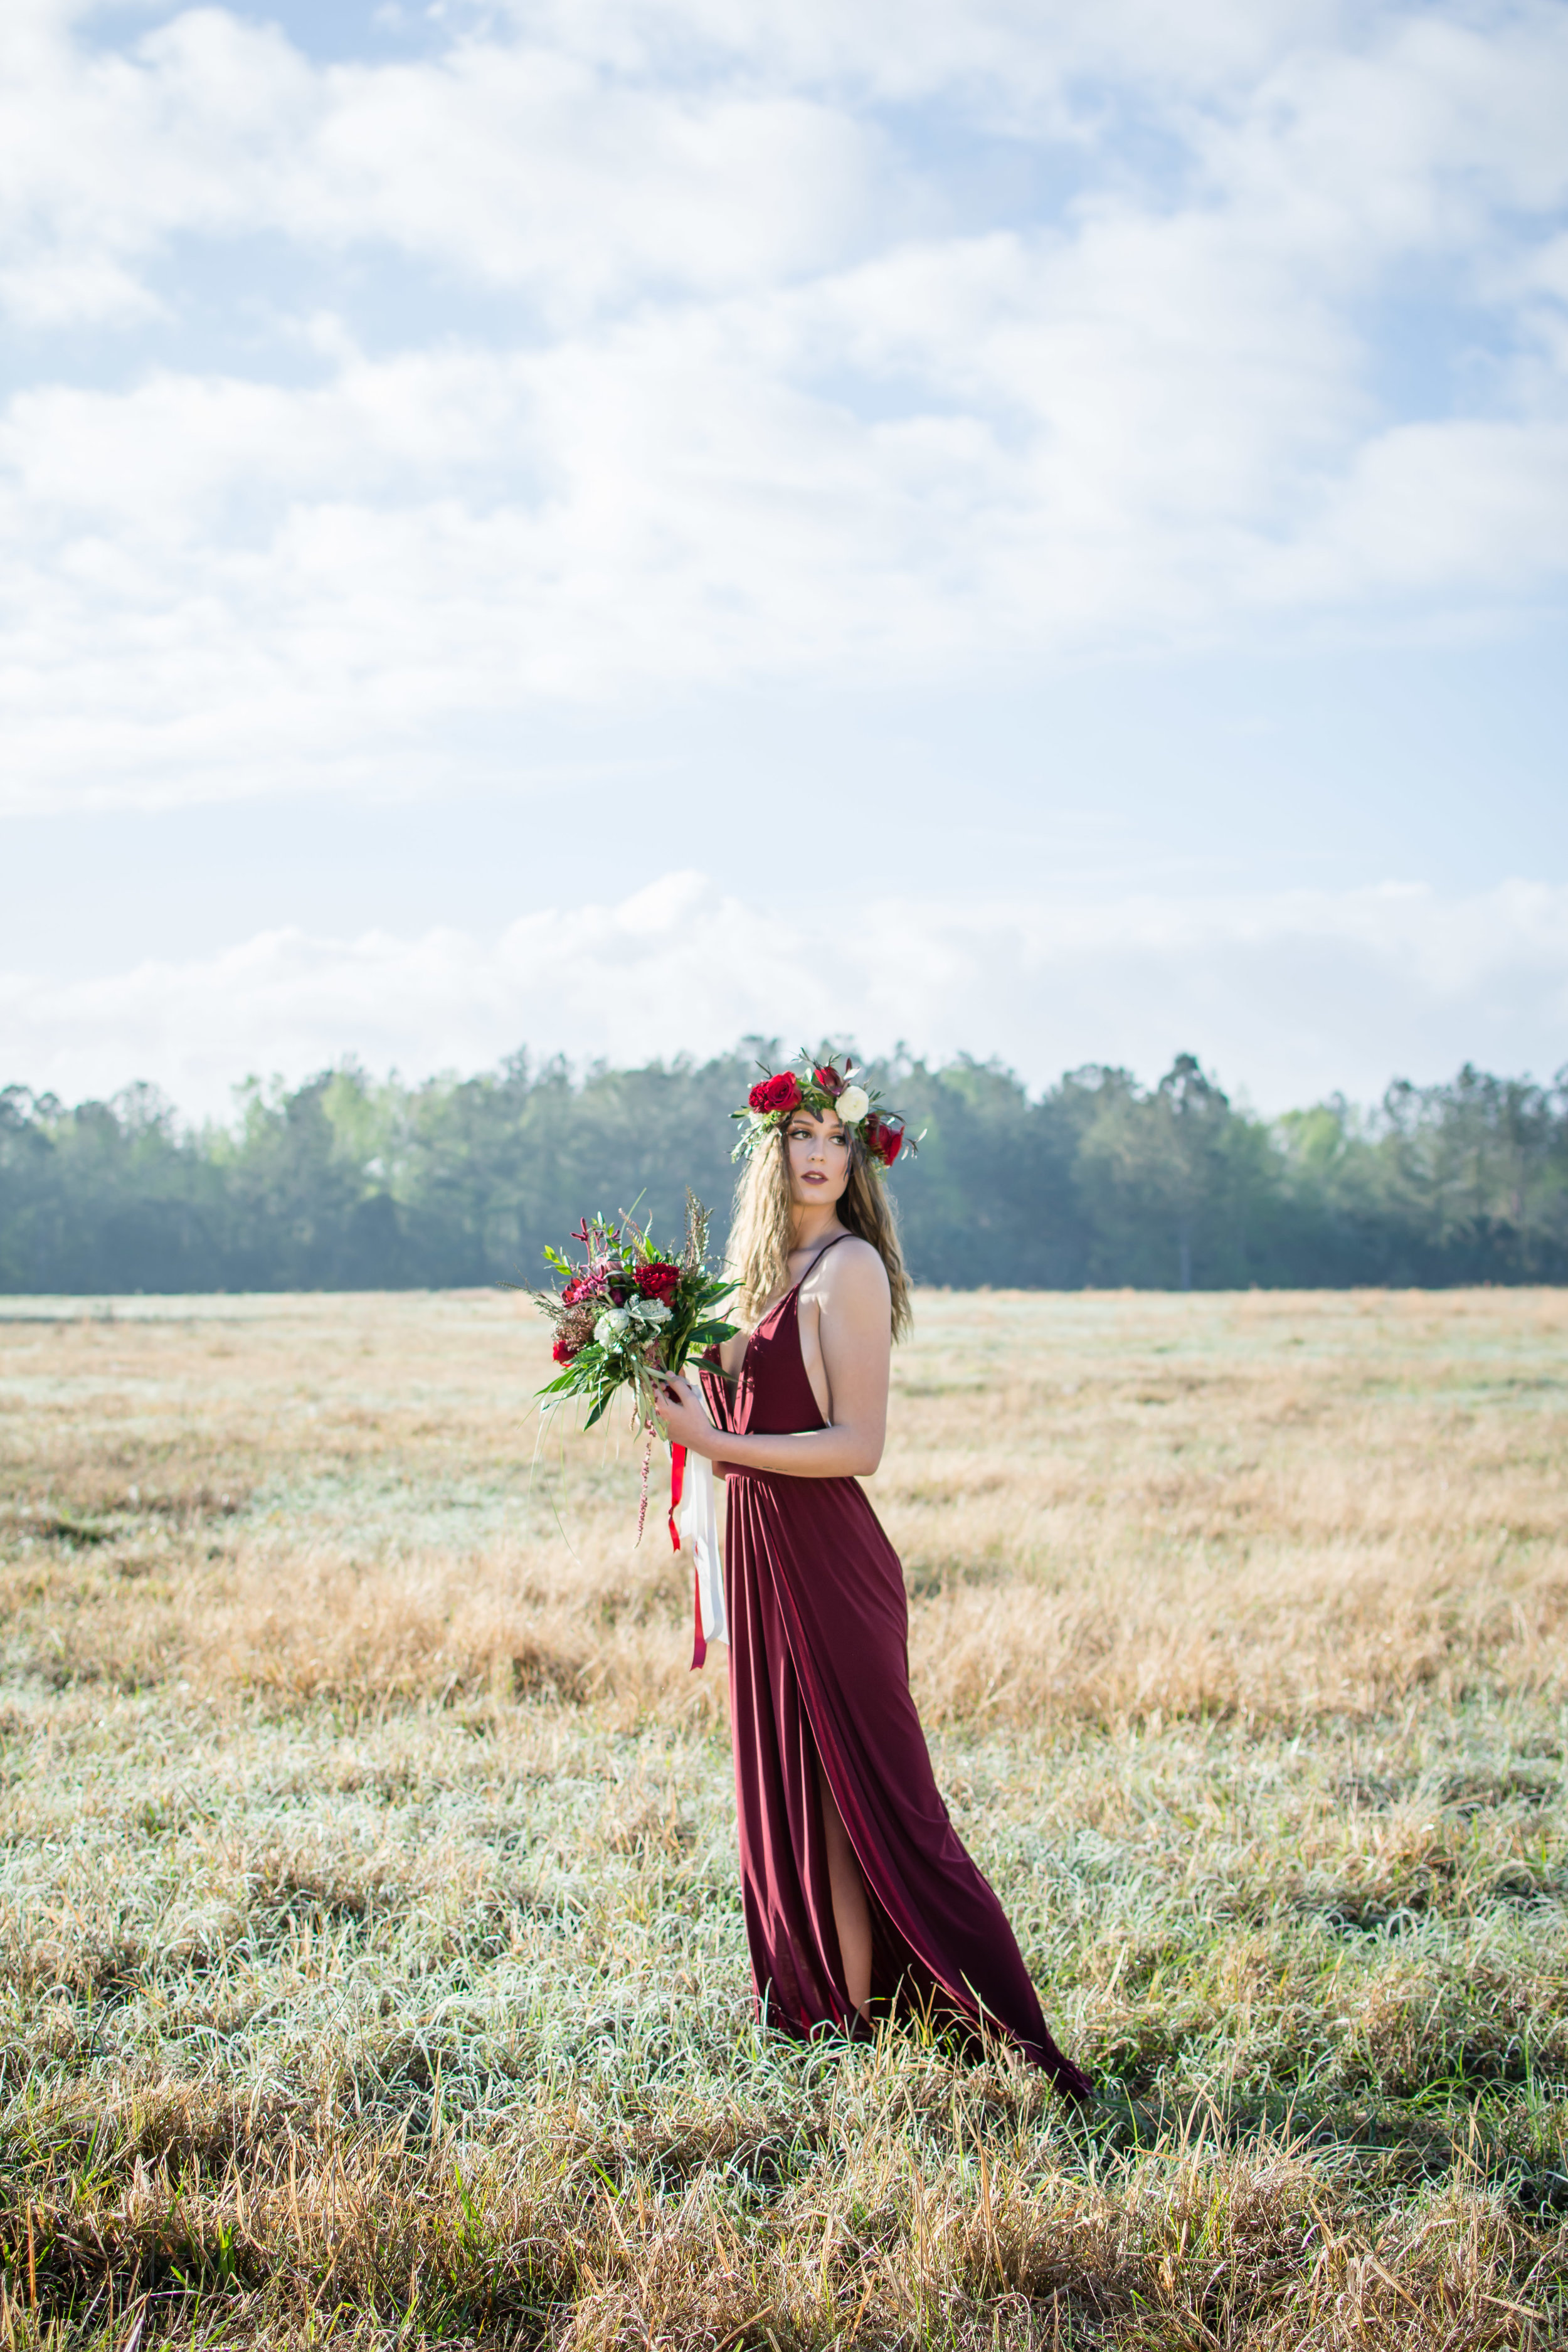 whimsical-bridal-inspiration-fashion-photoshoot-geneva-photographer-yanitza-ninett-4.jpg